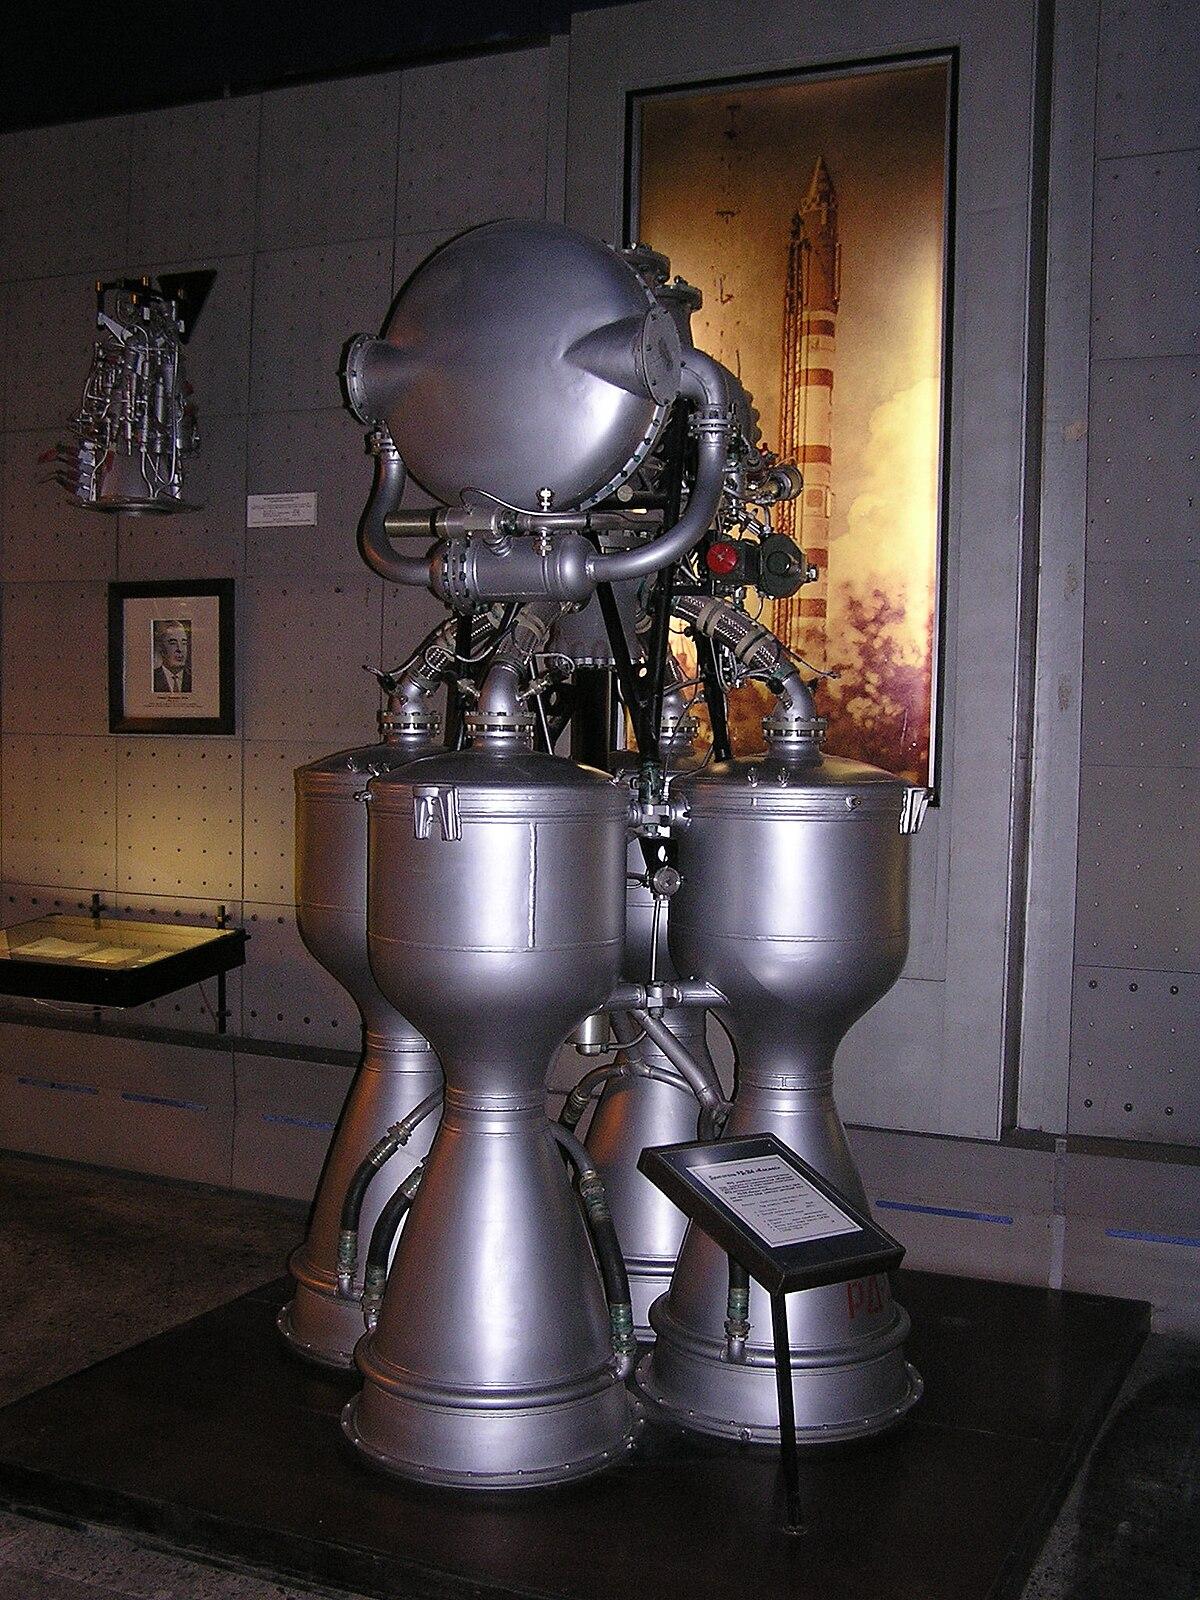 Px Rd Rocket Engine on Pressure Chamber Rocket Engine